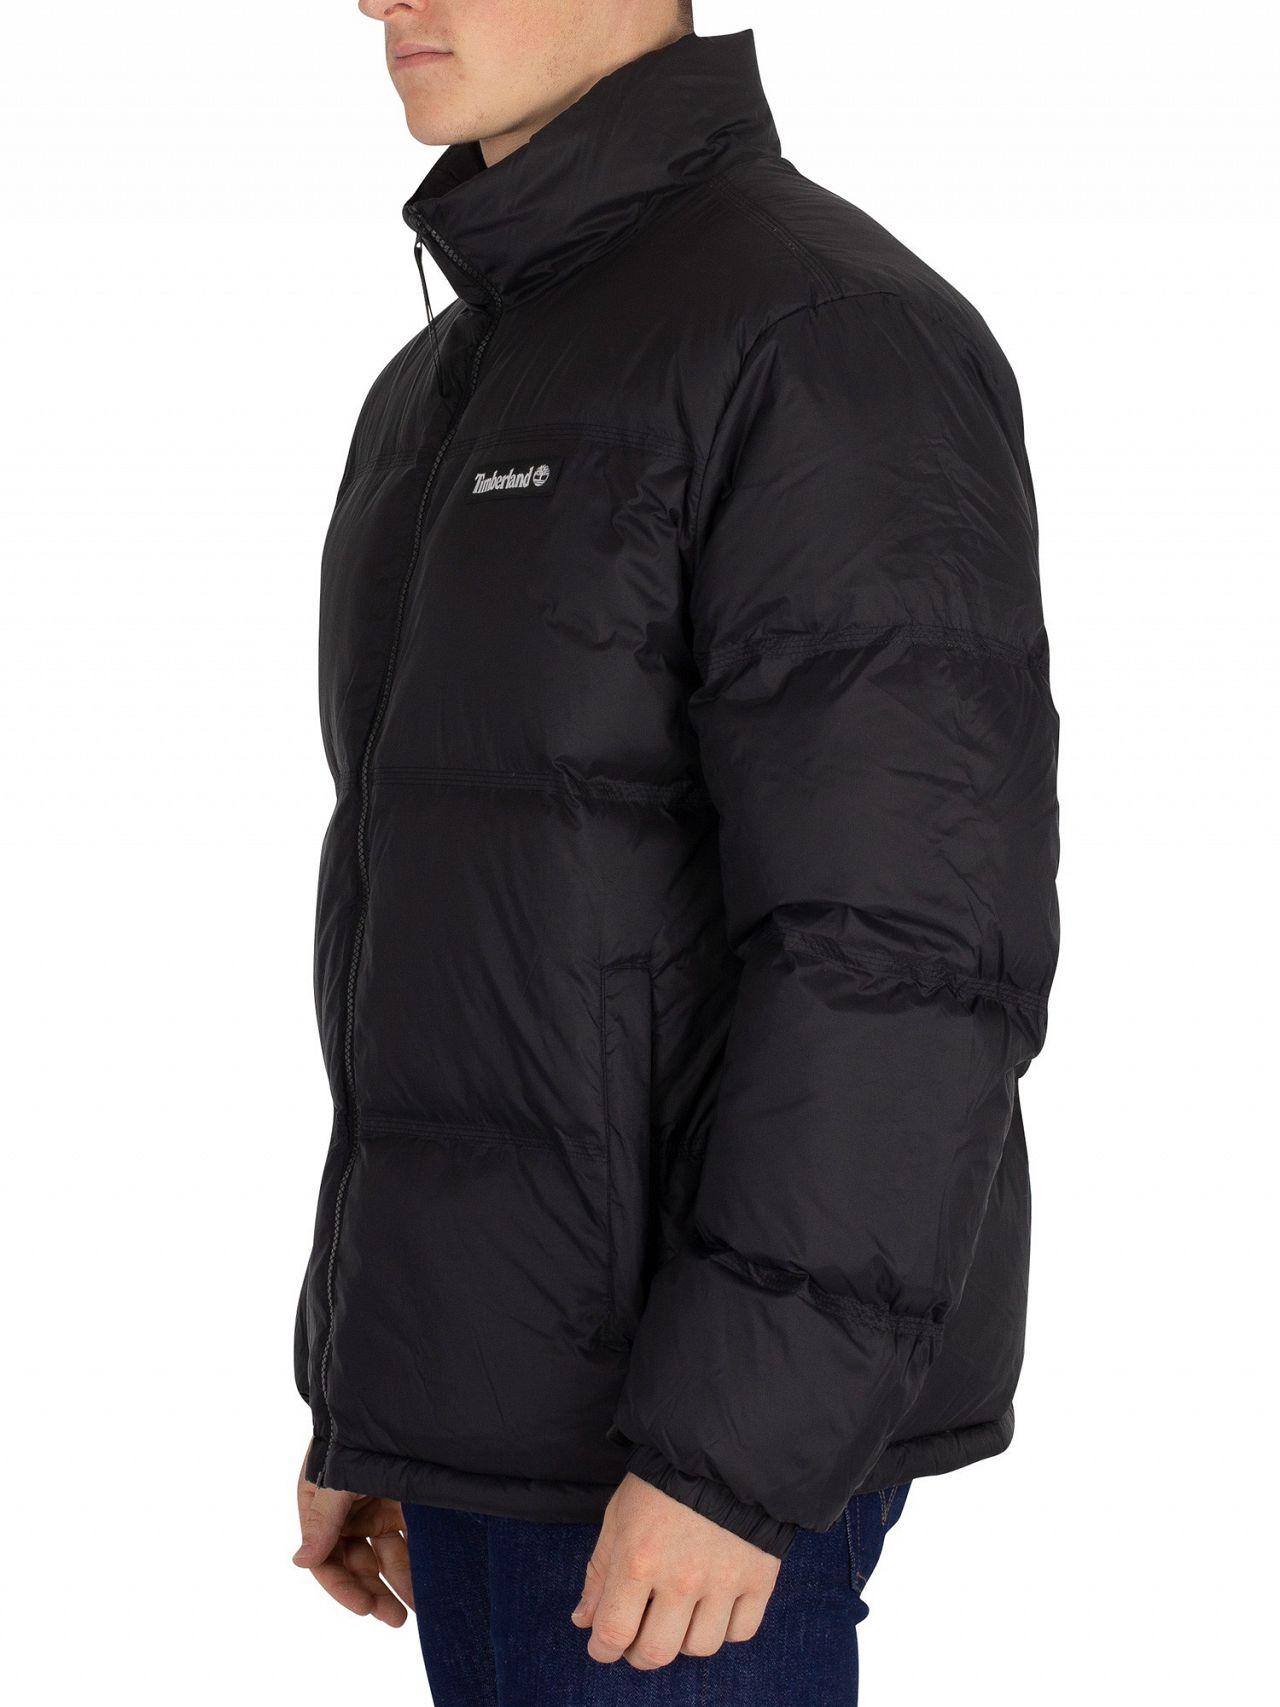 3b4400e8f1ab Timberland Black Down Puffer Jacket